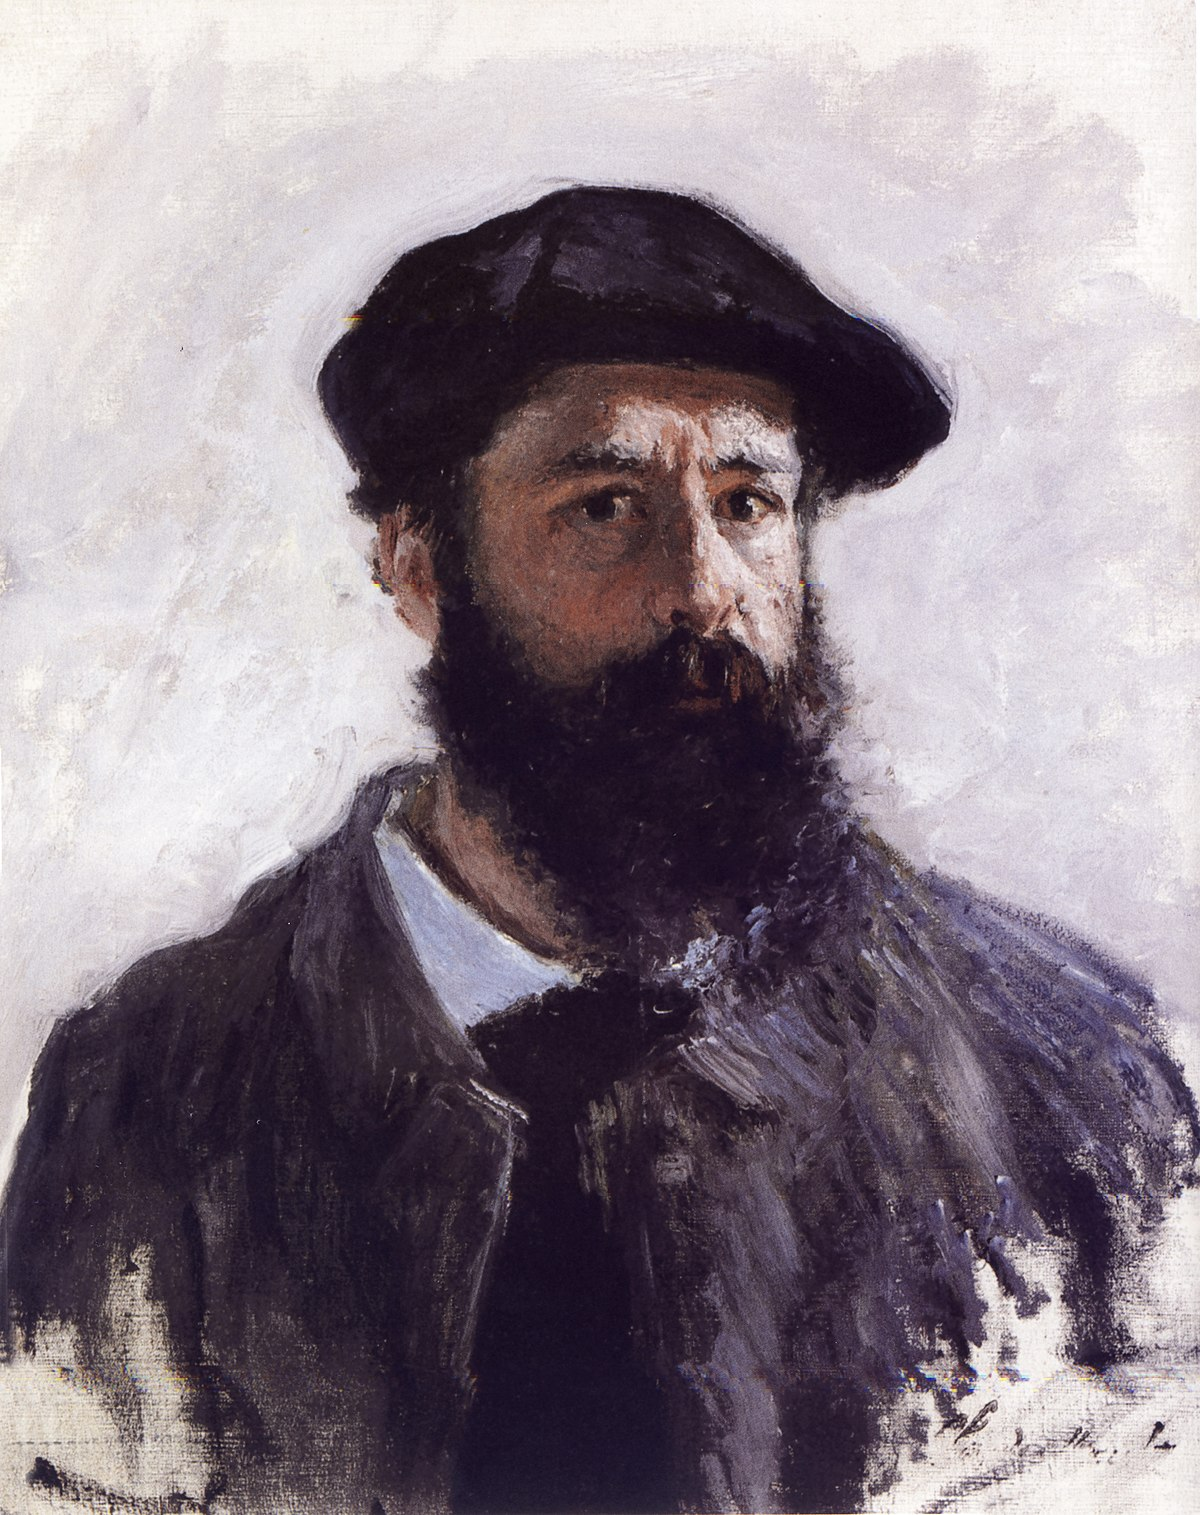 fee2da82cd30 Claude Monet - Wikipedia